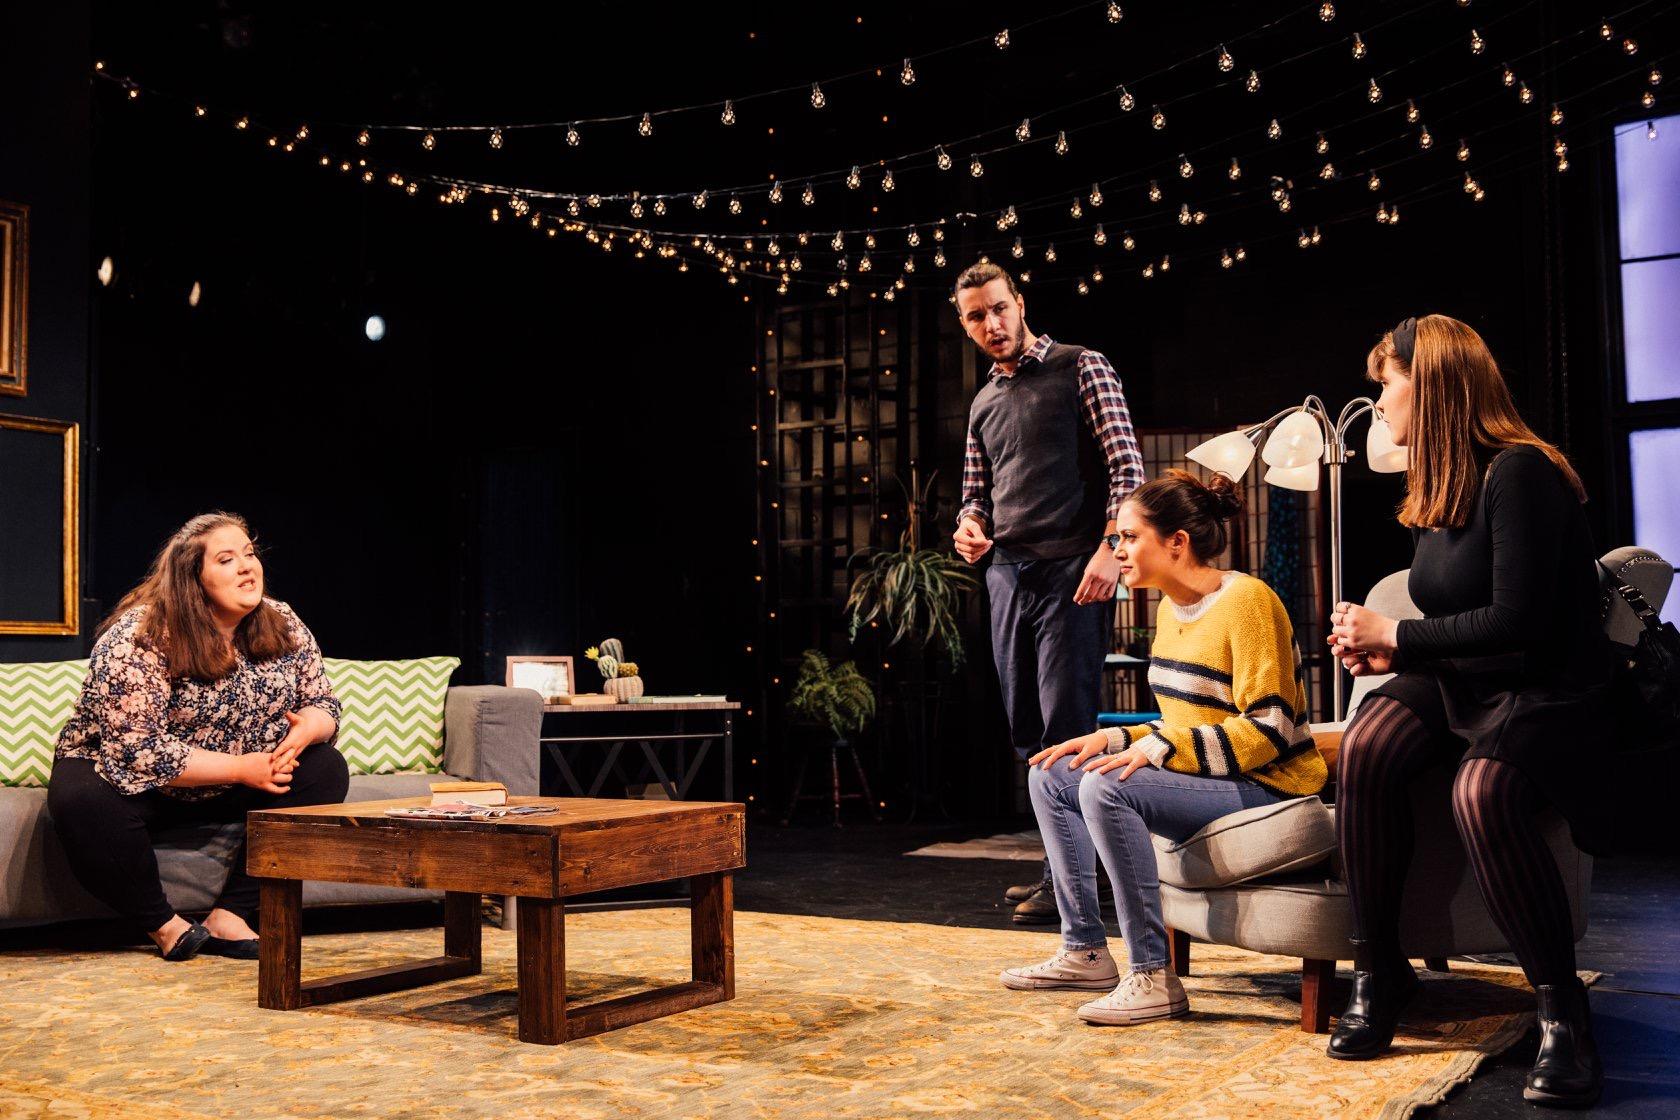 From left: Stanley, Tessa (Emily Combs), Ellen (Kris Bramson), and Diane (Caroline Parker). Spring 2019.